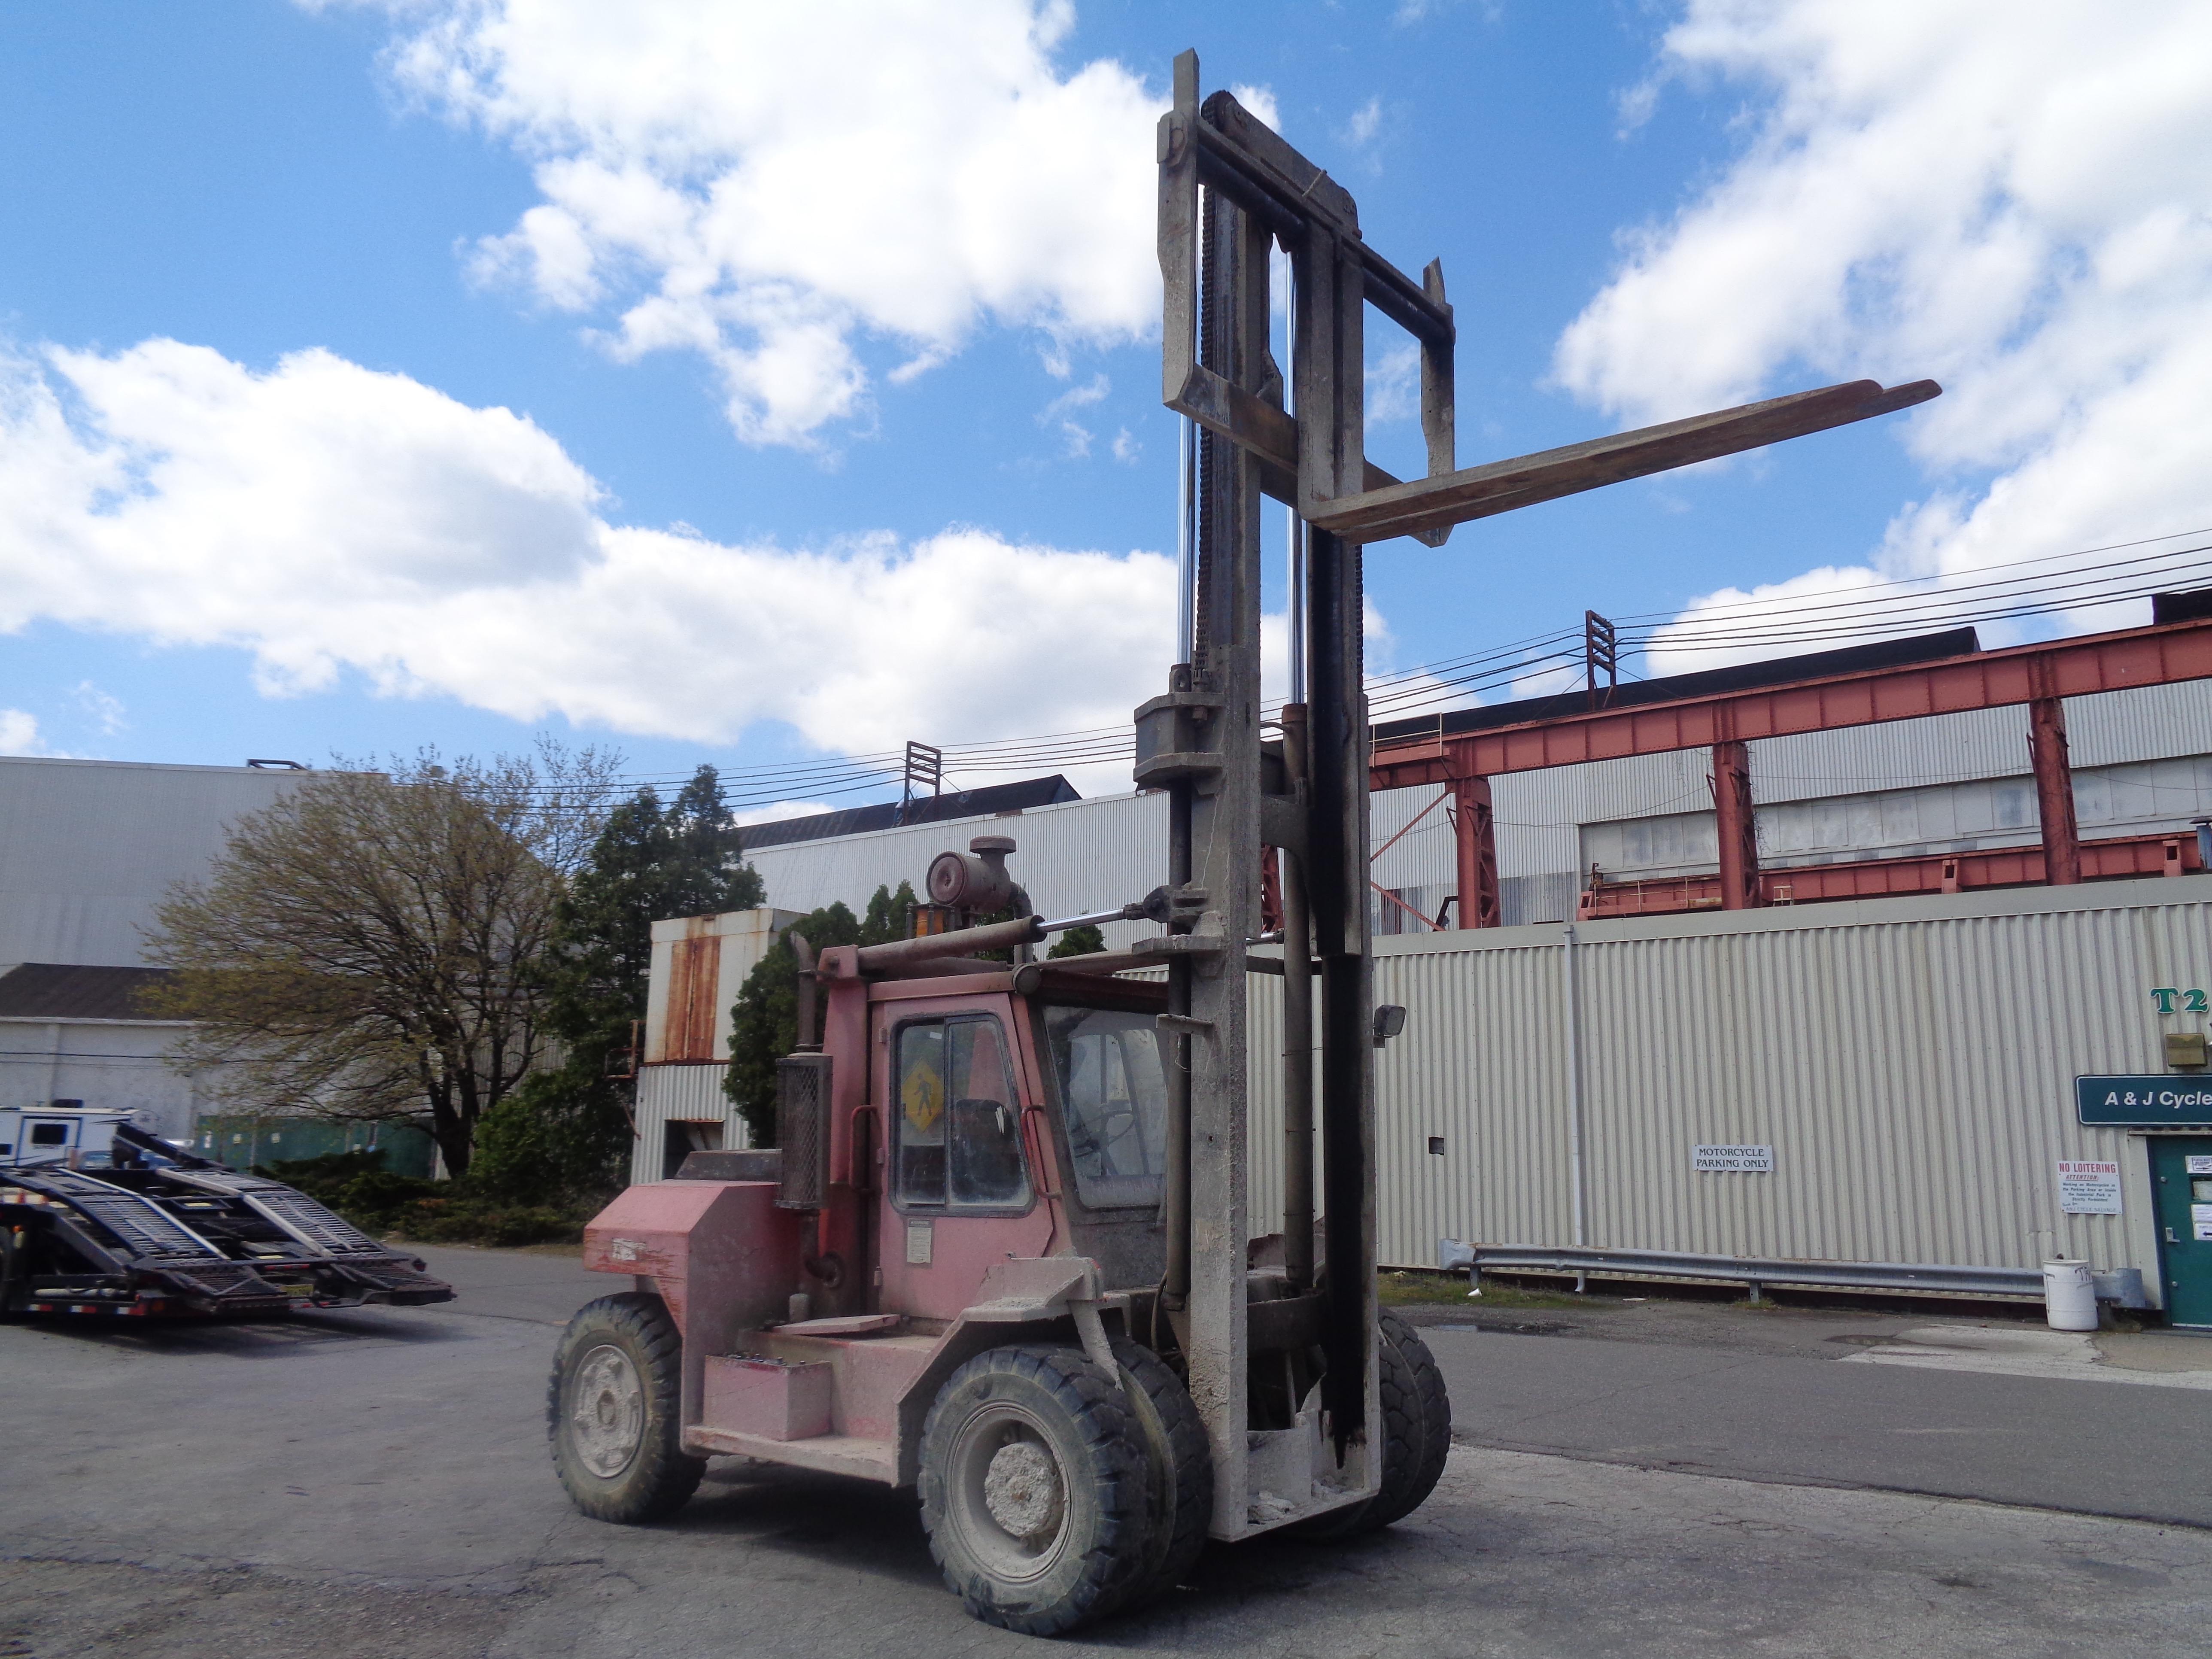 Lot 55 - Taylor TE200S 20,000 lb Forklift